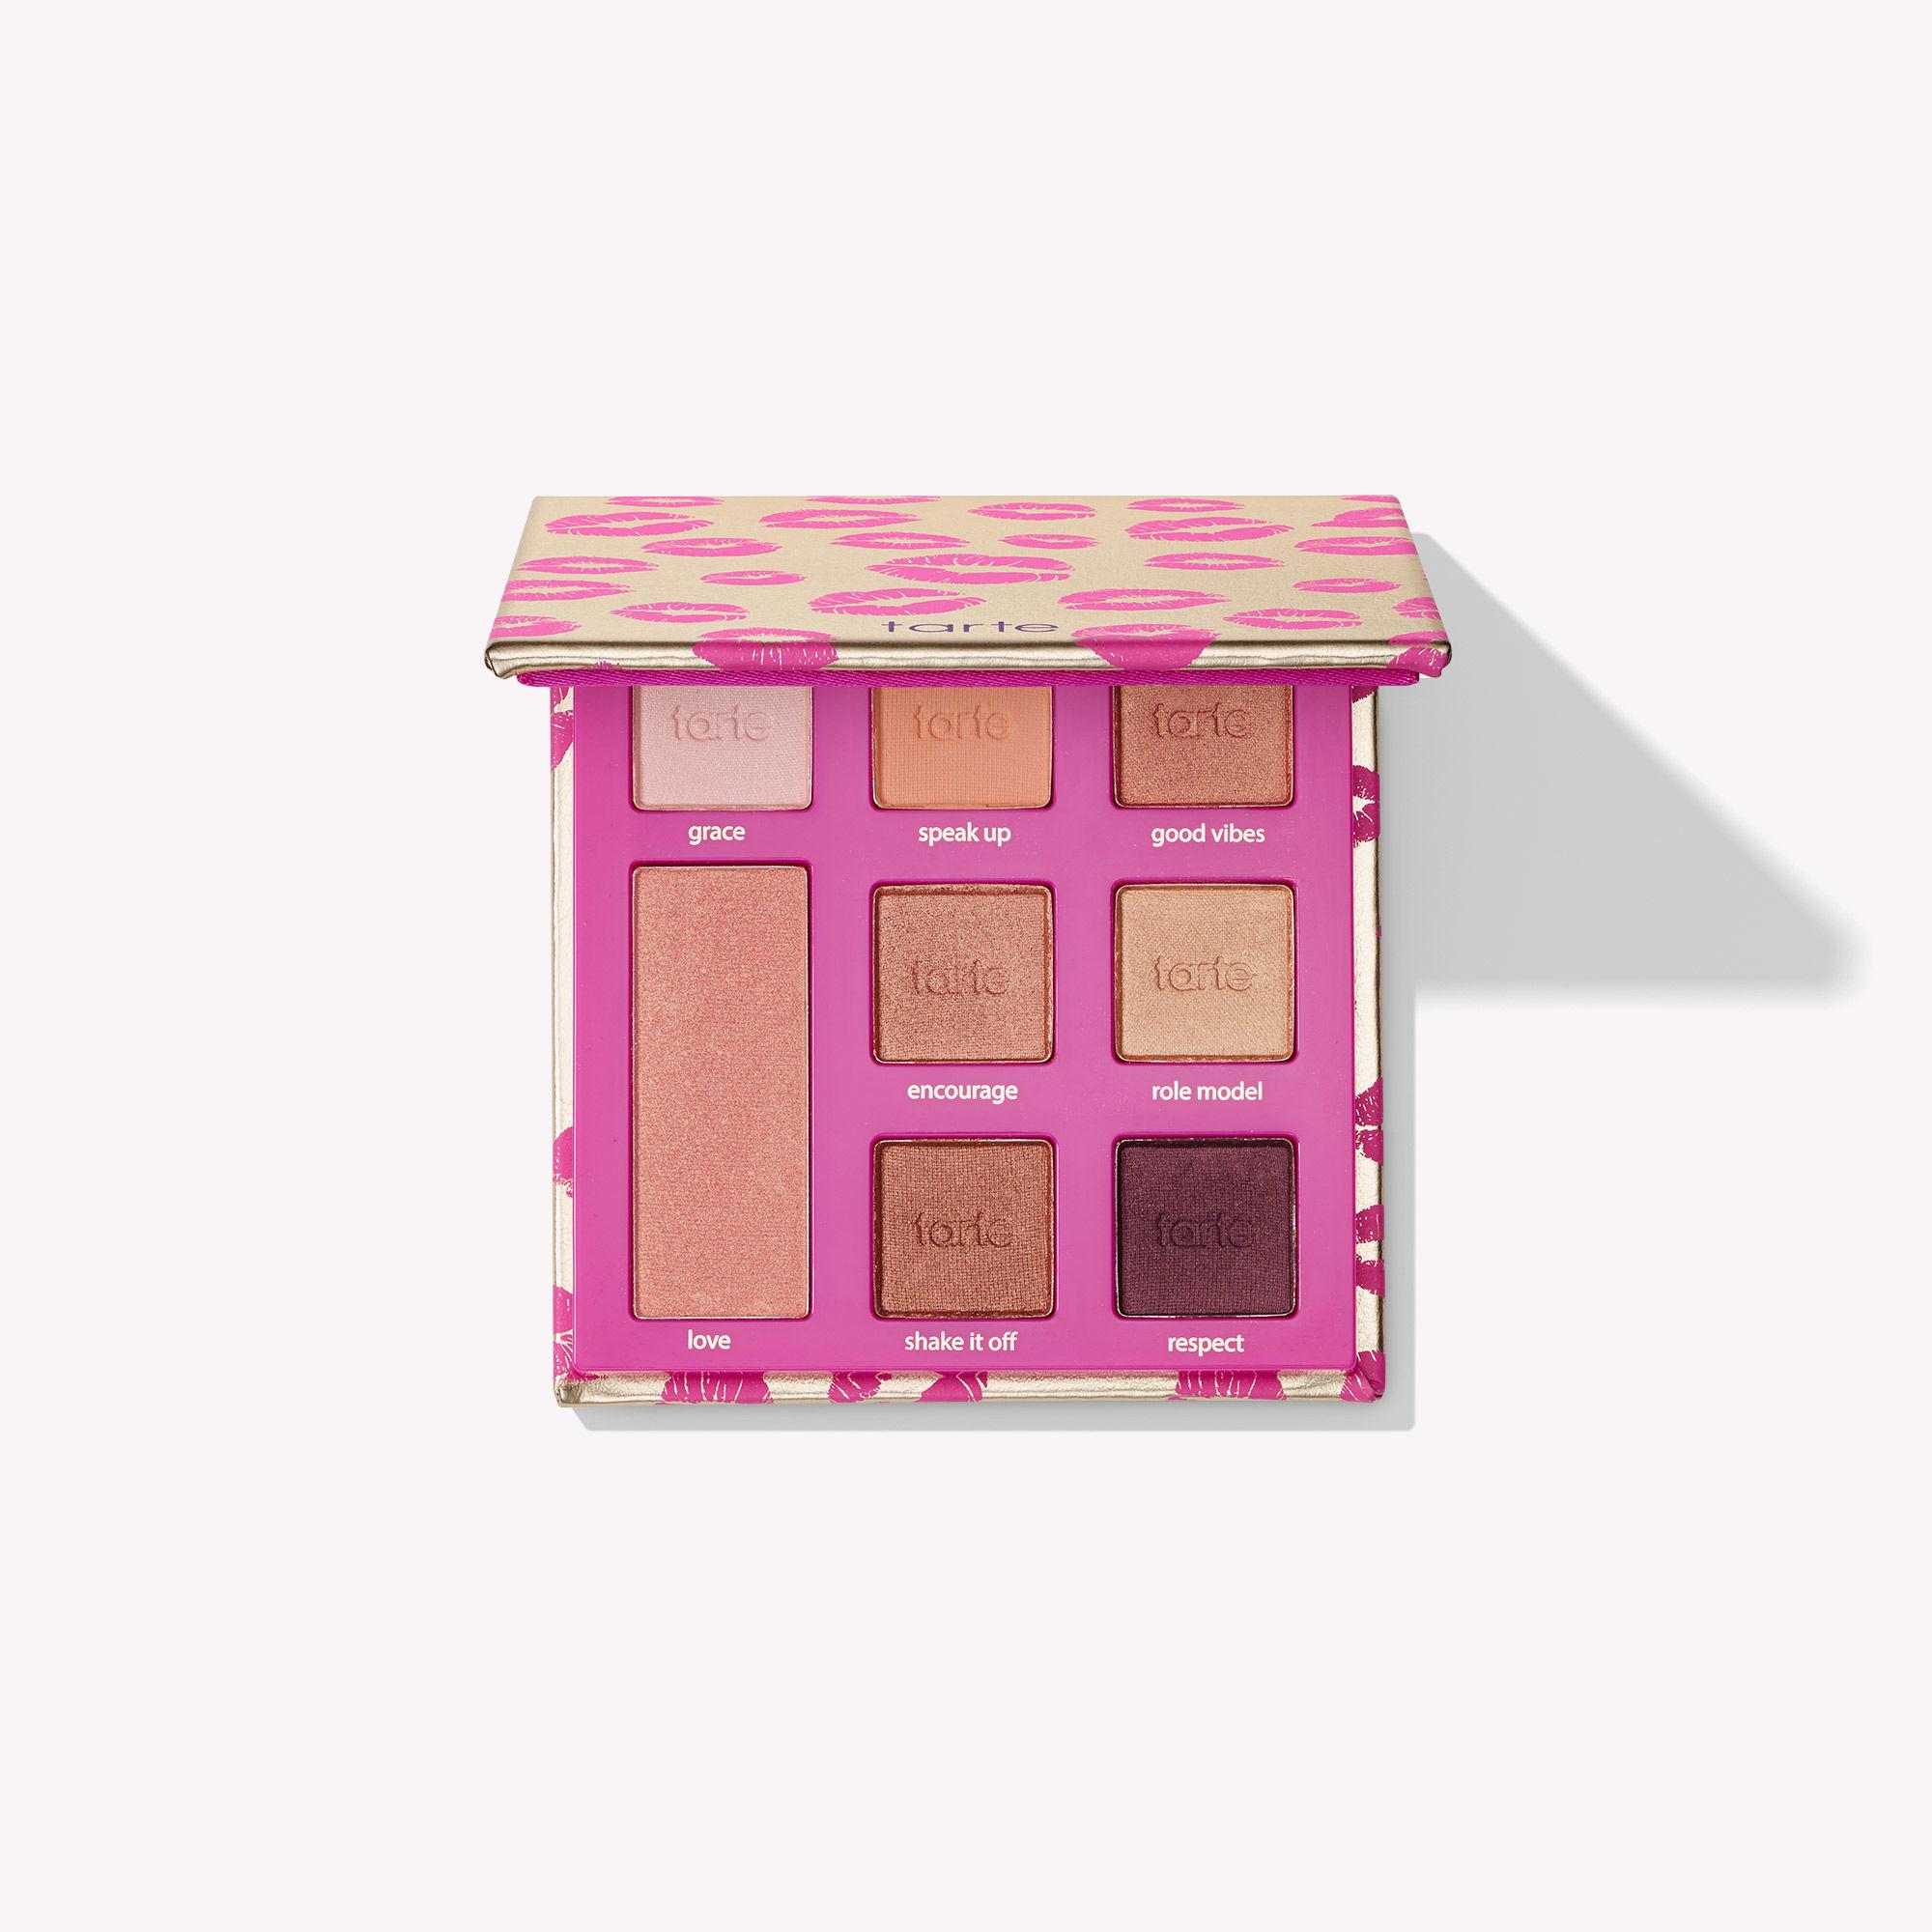 tarte™ leave your mark eyeshadow palette